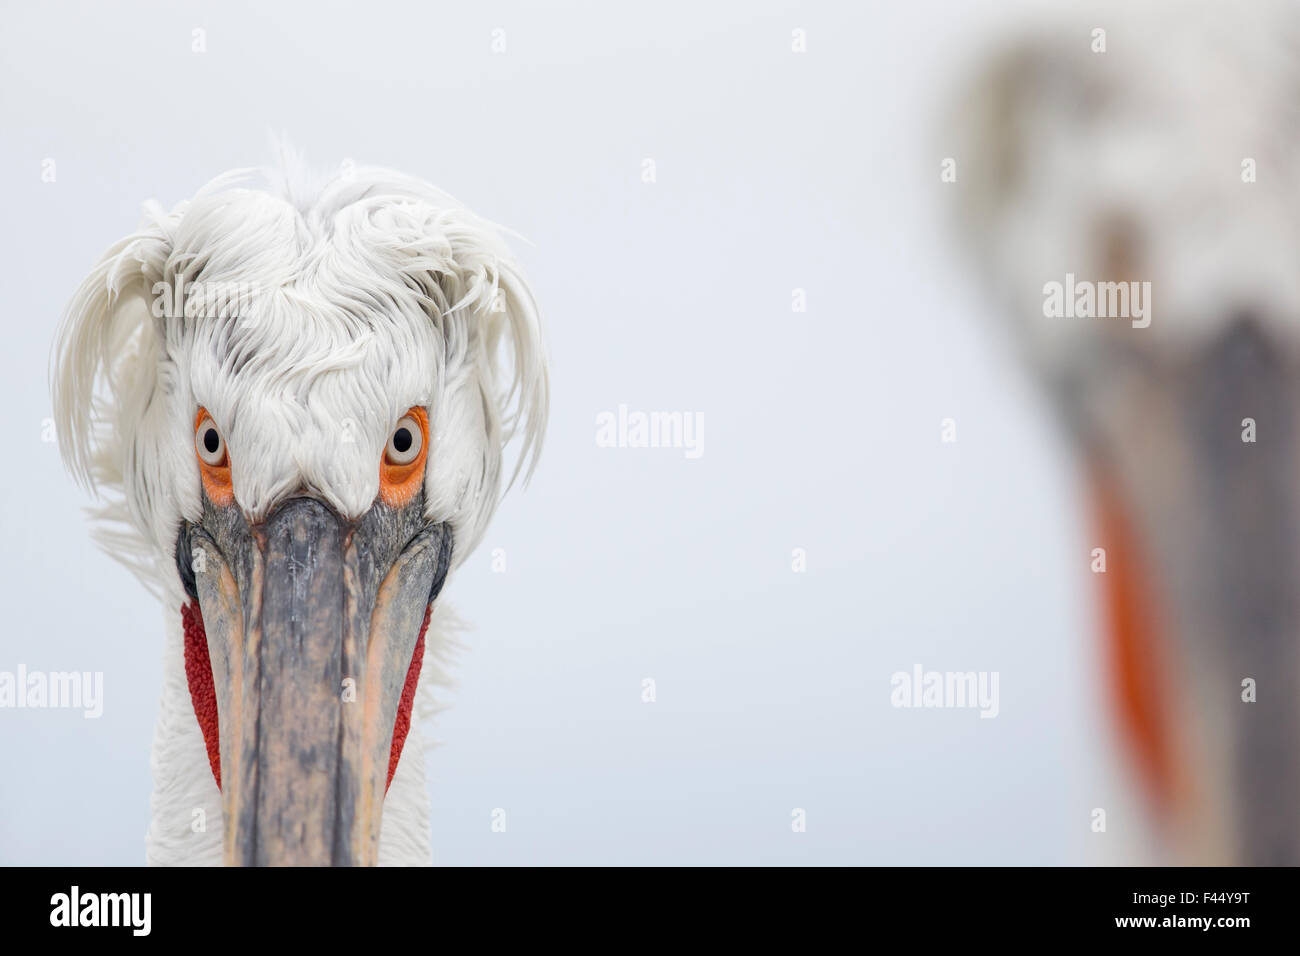 Krauskopfpelikan (Pelecanus Crispus) Porträt, See Kerkini, Griechenland. Februar. Hoch in die Vögel Kategorie von Stockfoto